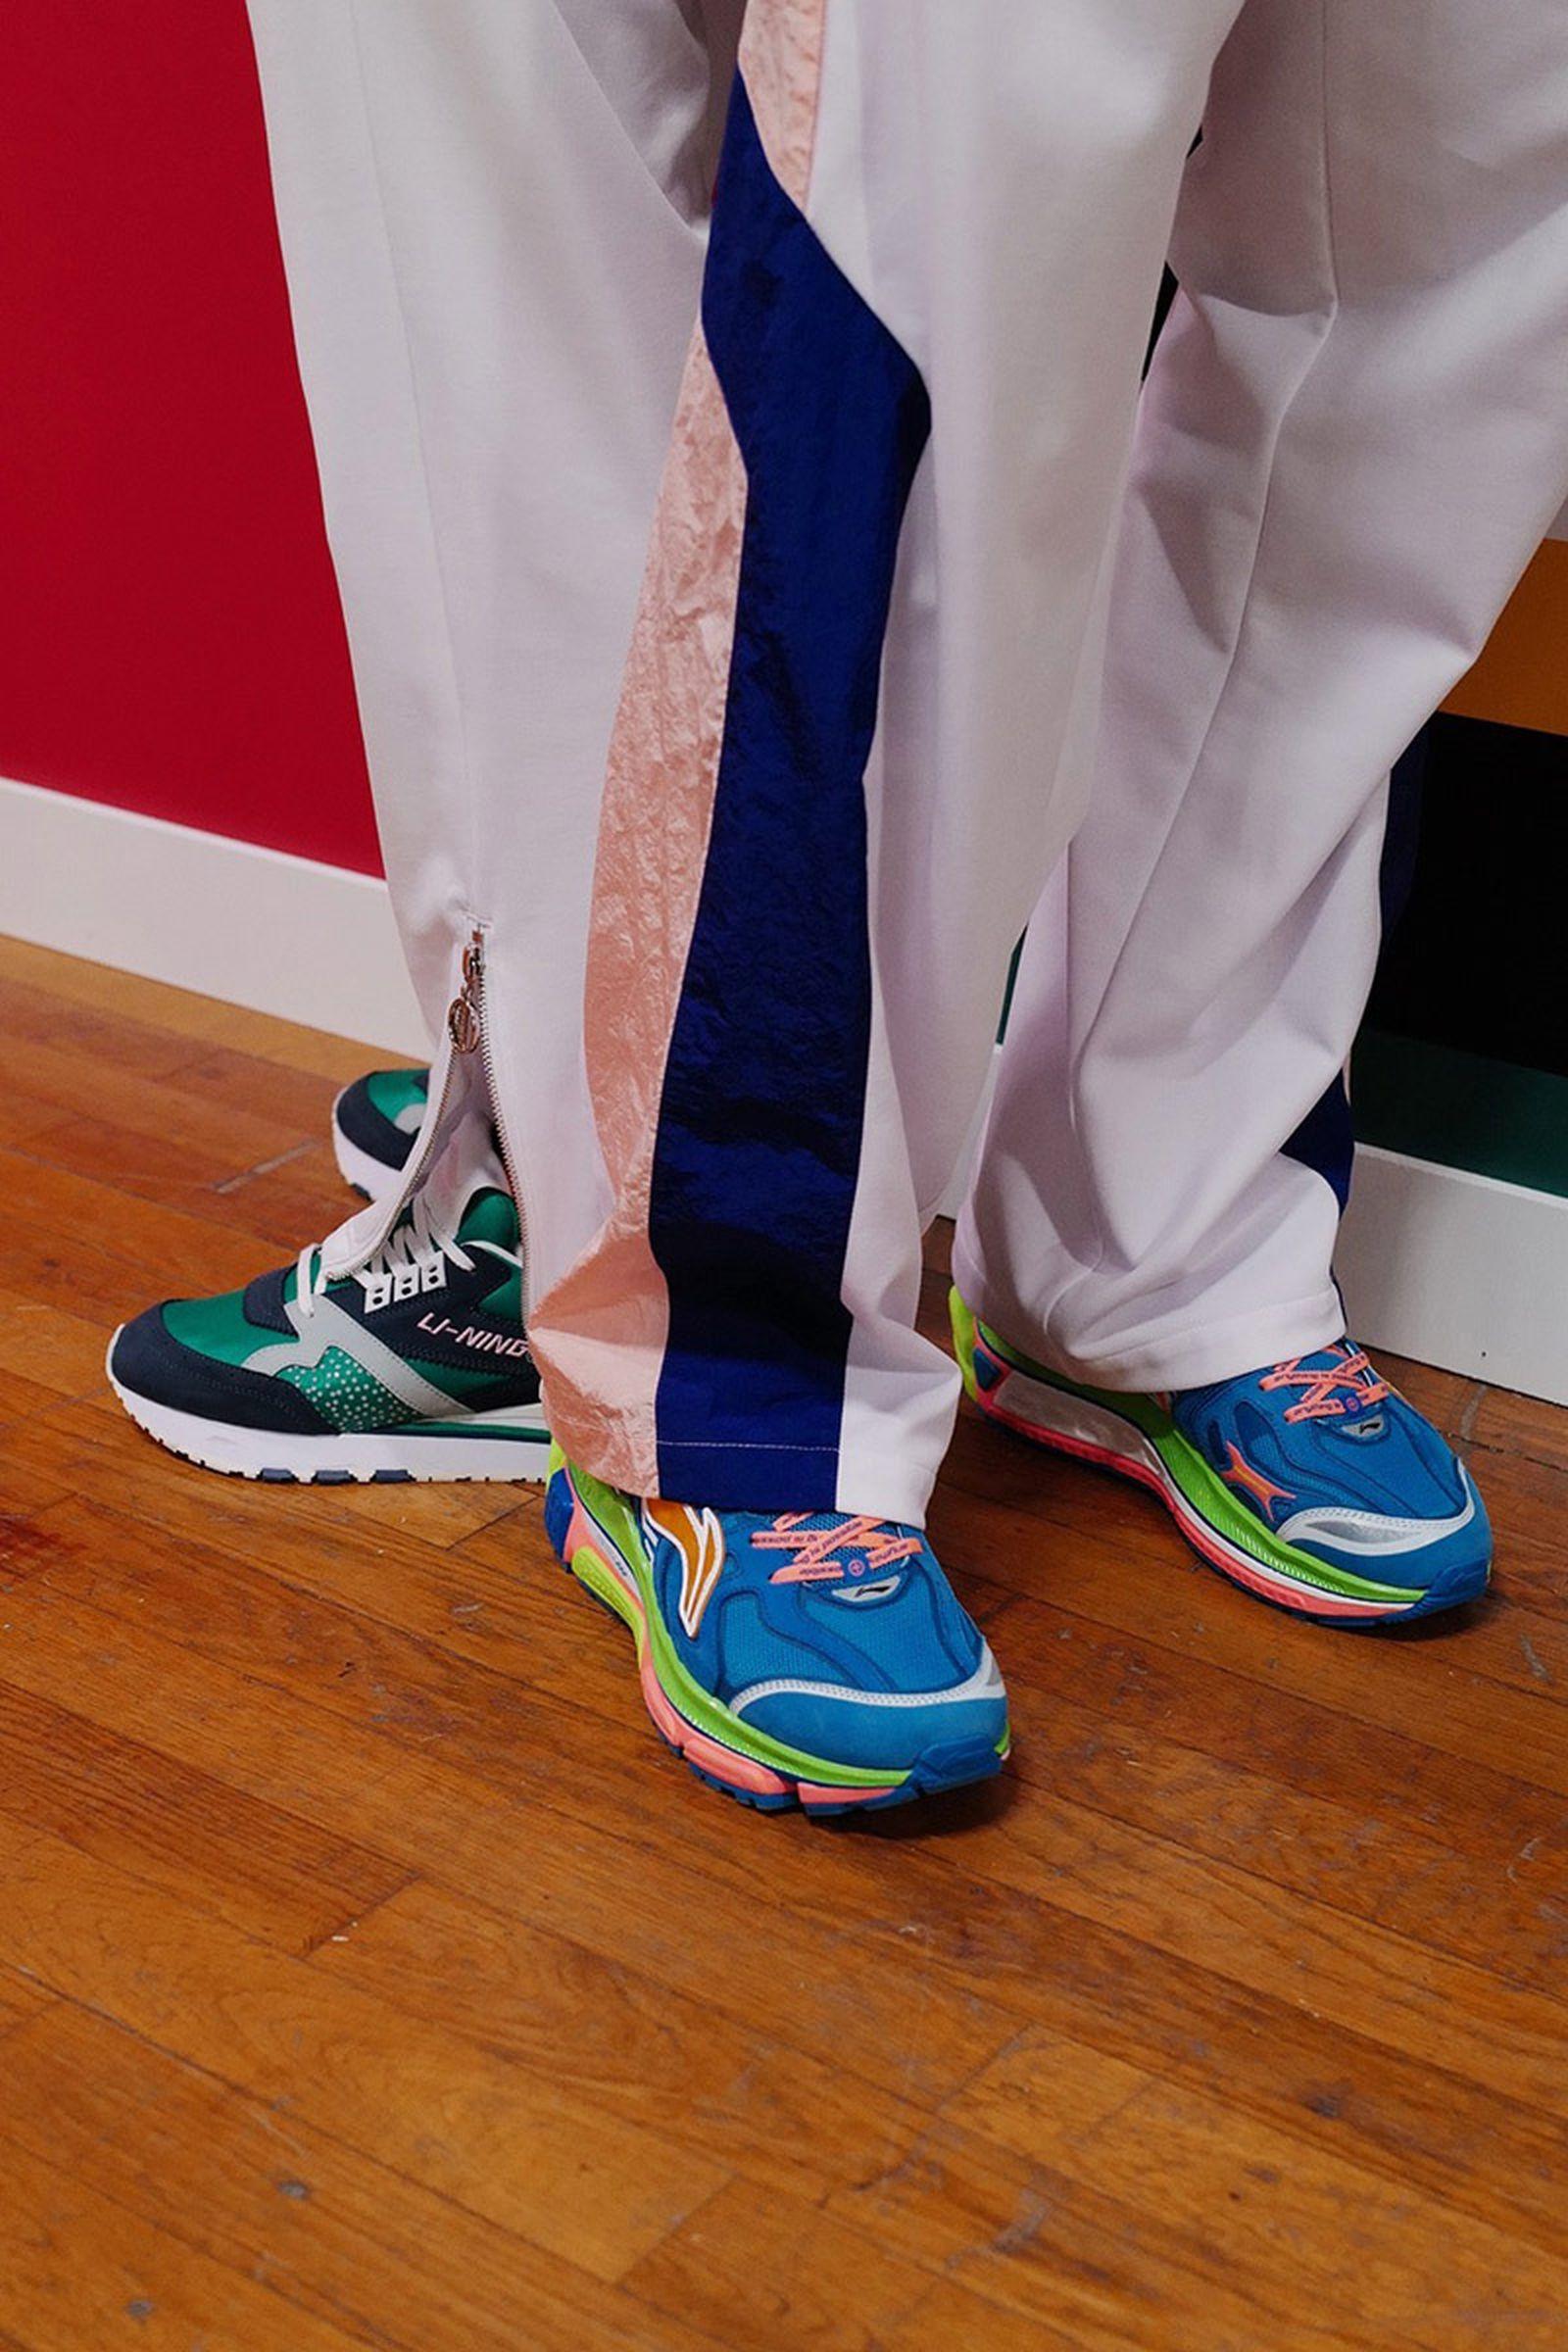 li ning ss20 sneakers IMG 1706 Louis Vuitton Nike OAMC